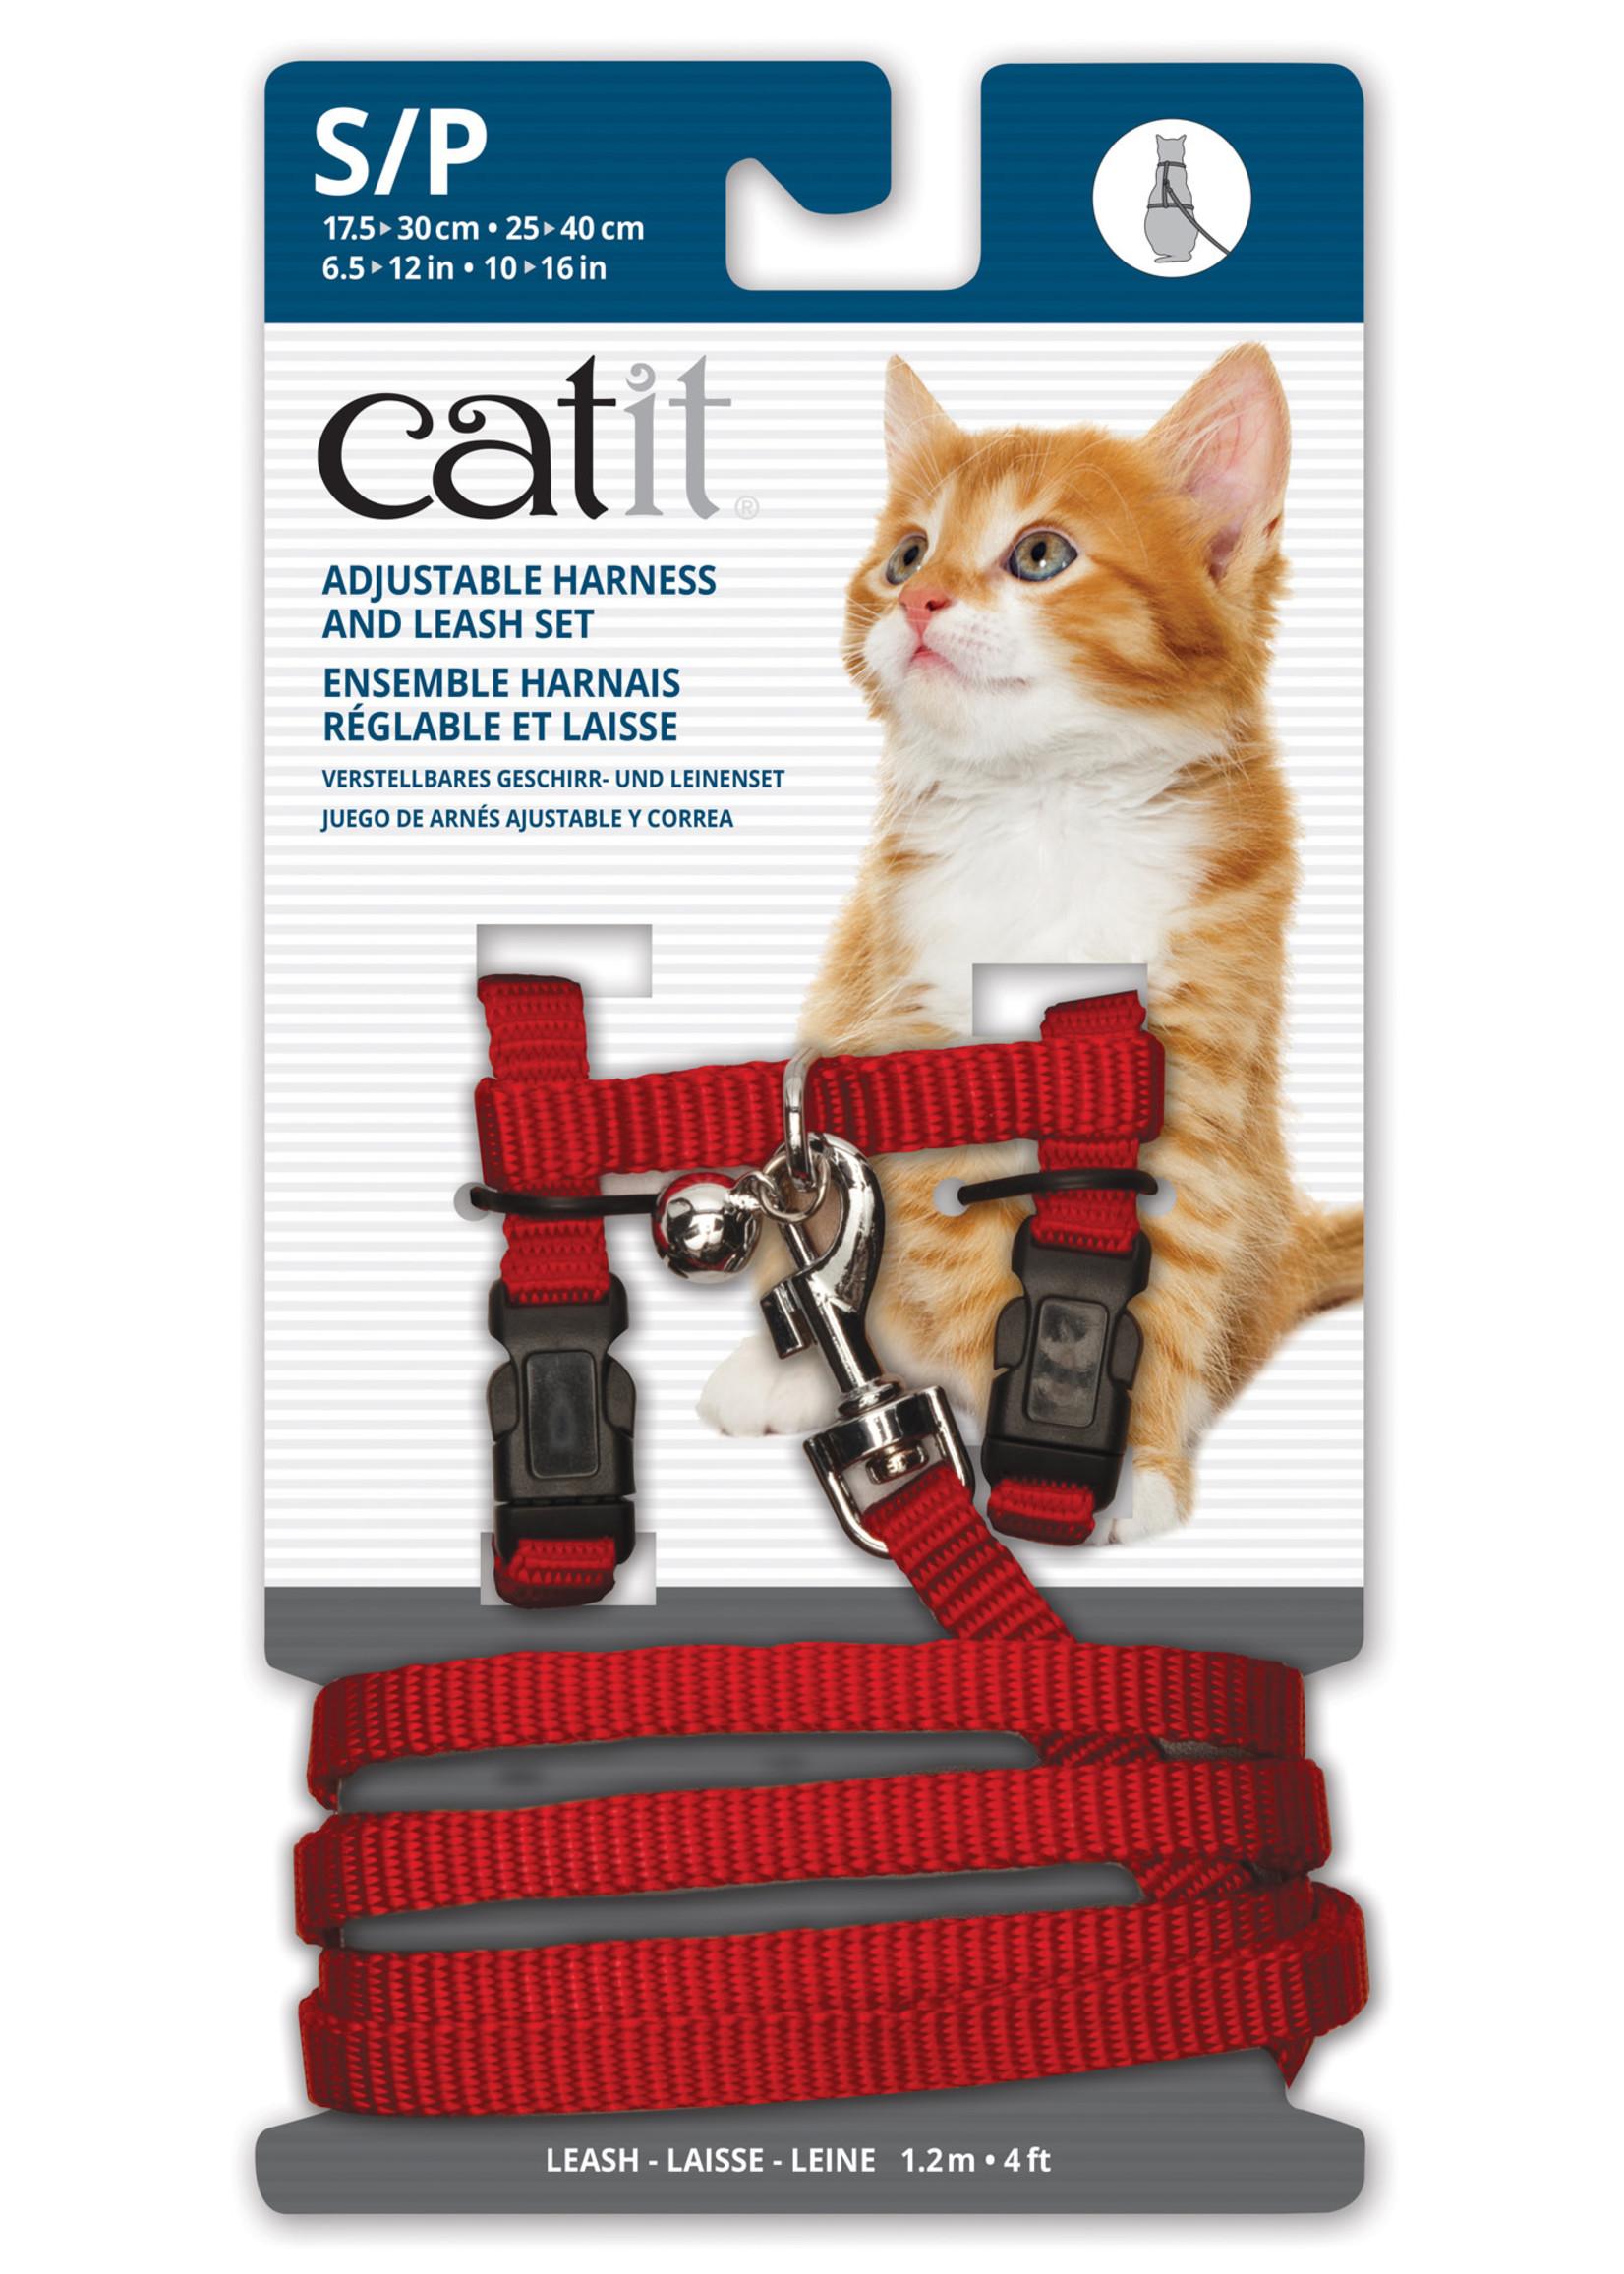 Catit® CAT IT ADJUSTABLE HARNESS&LEASH RED SML